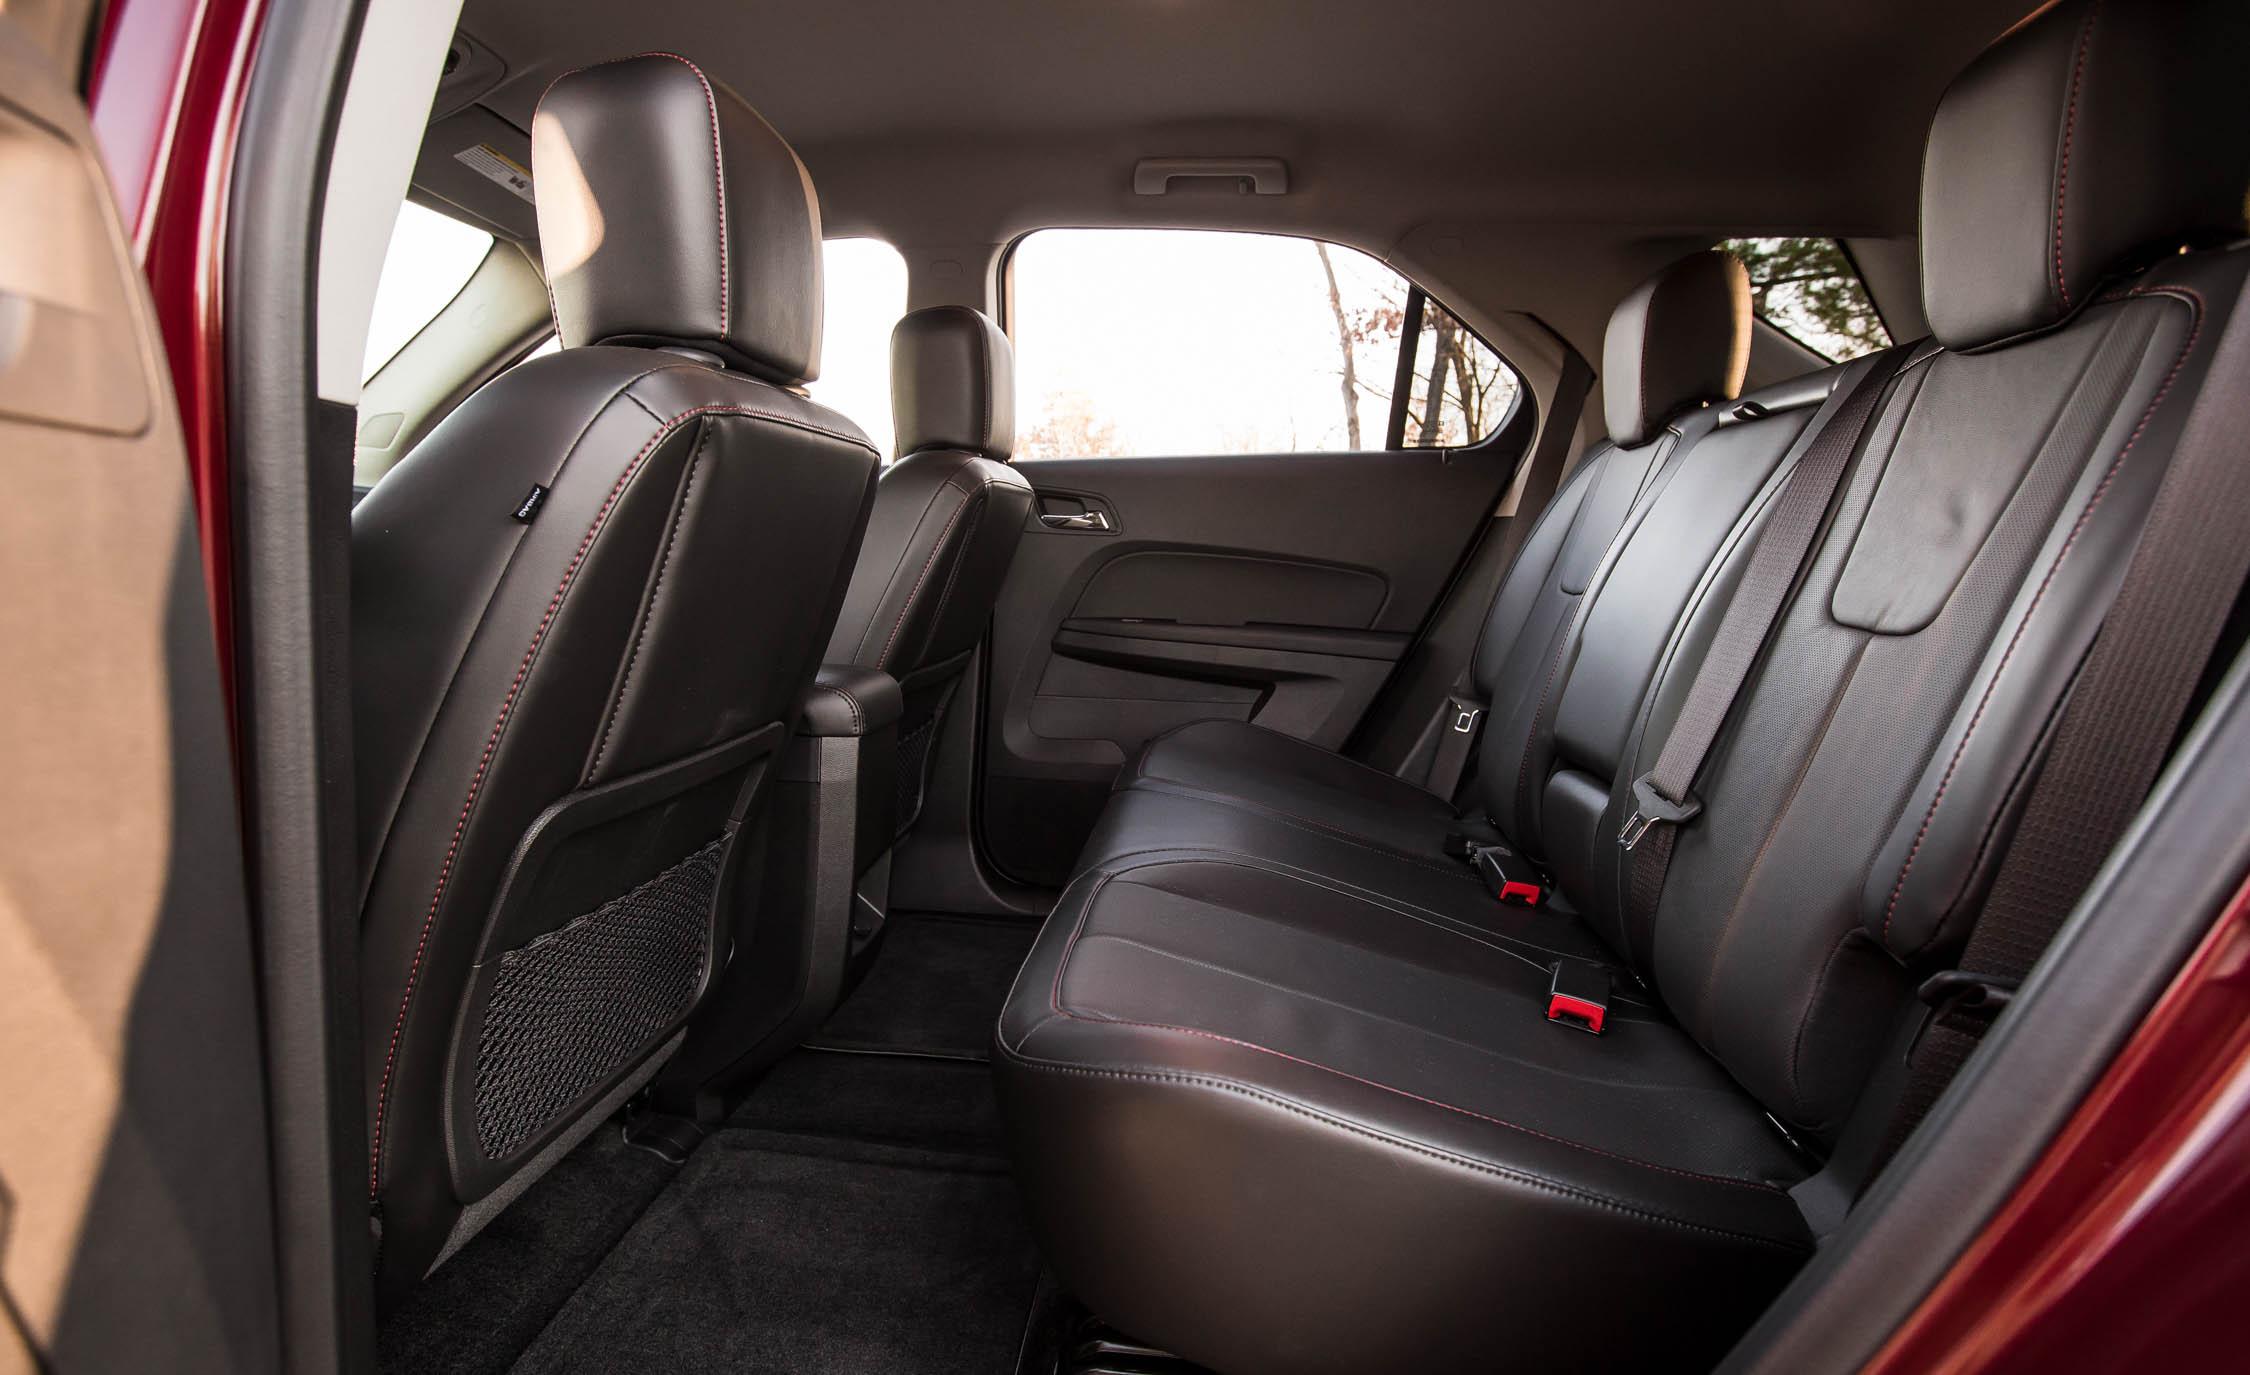 2016 Chevrolet Equinox LTZ (Photo 10 of 25)